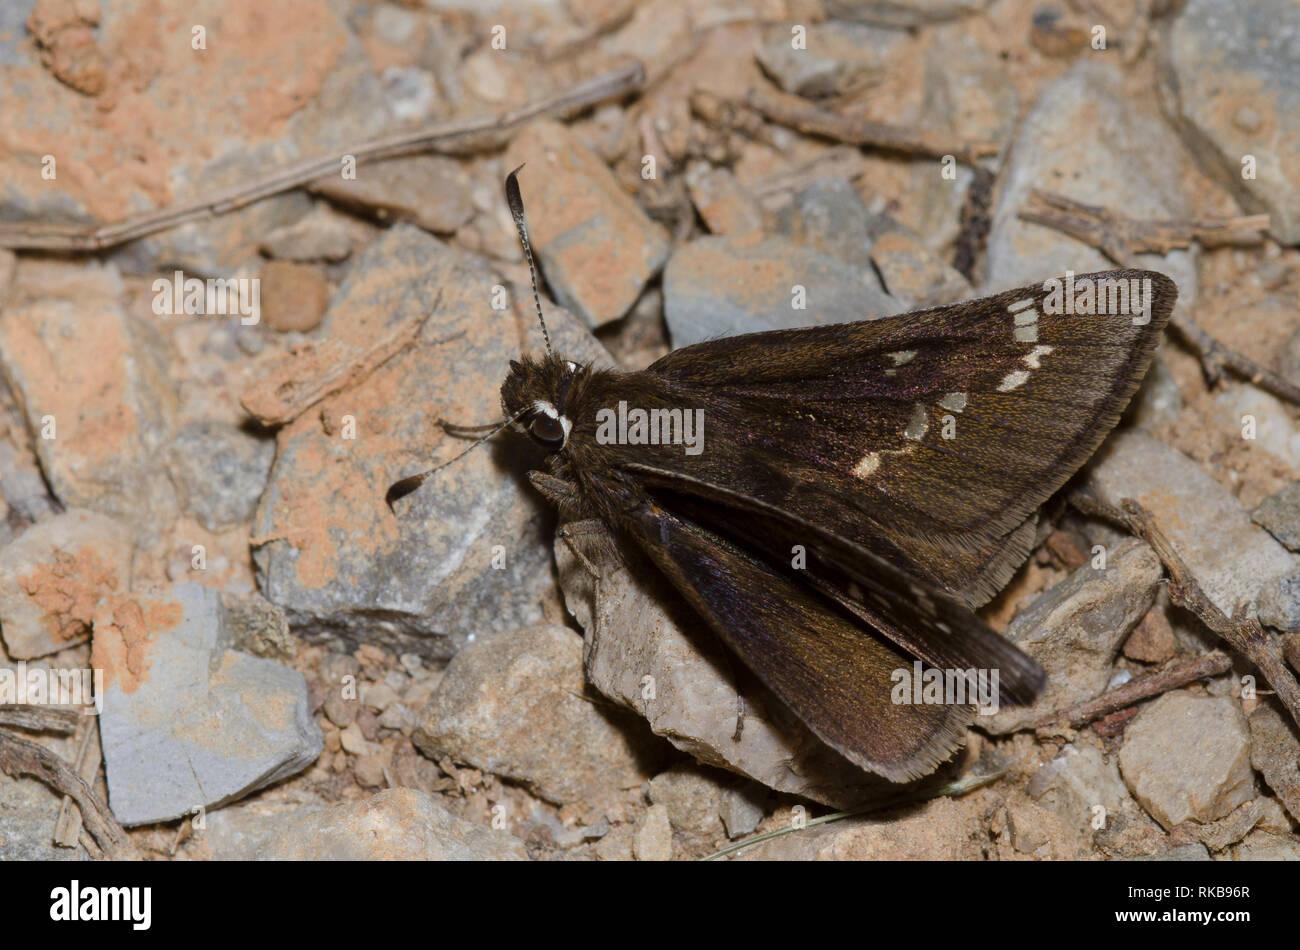 Dusted Skipper, Atrytonopsis hianna - Stock Image